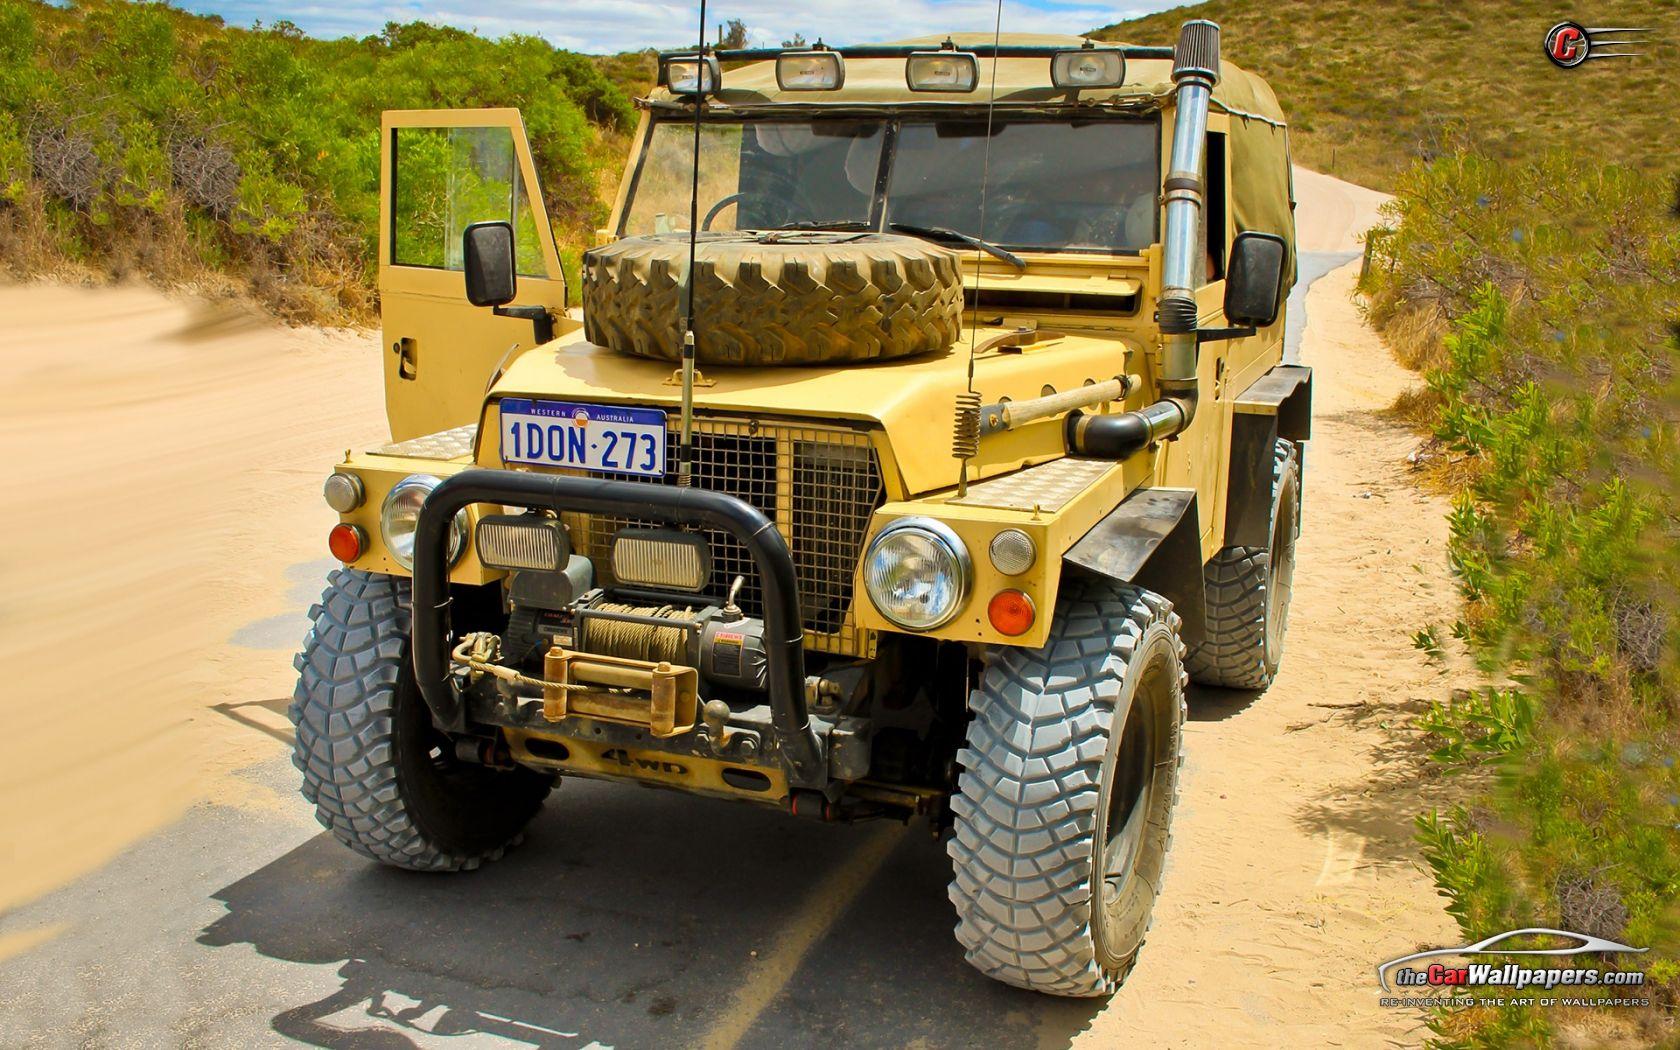 Land Rover Defender Modified | Land rover defender ...